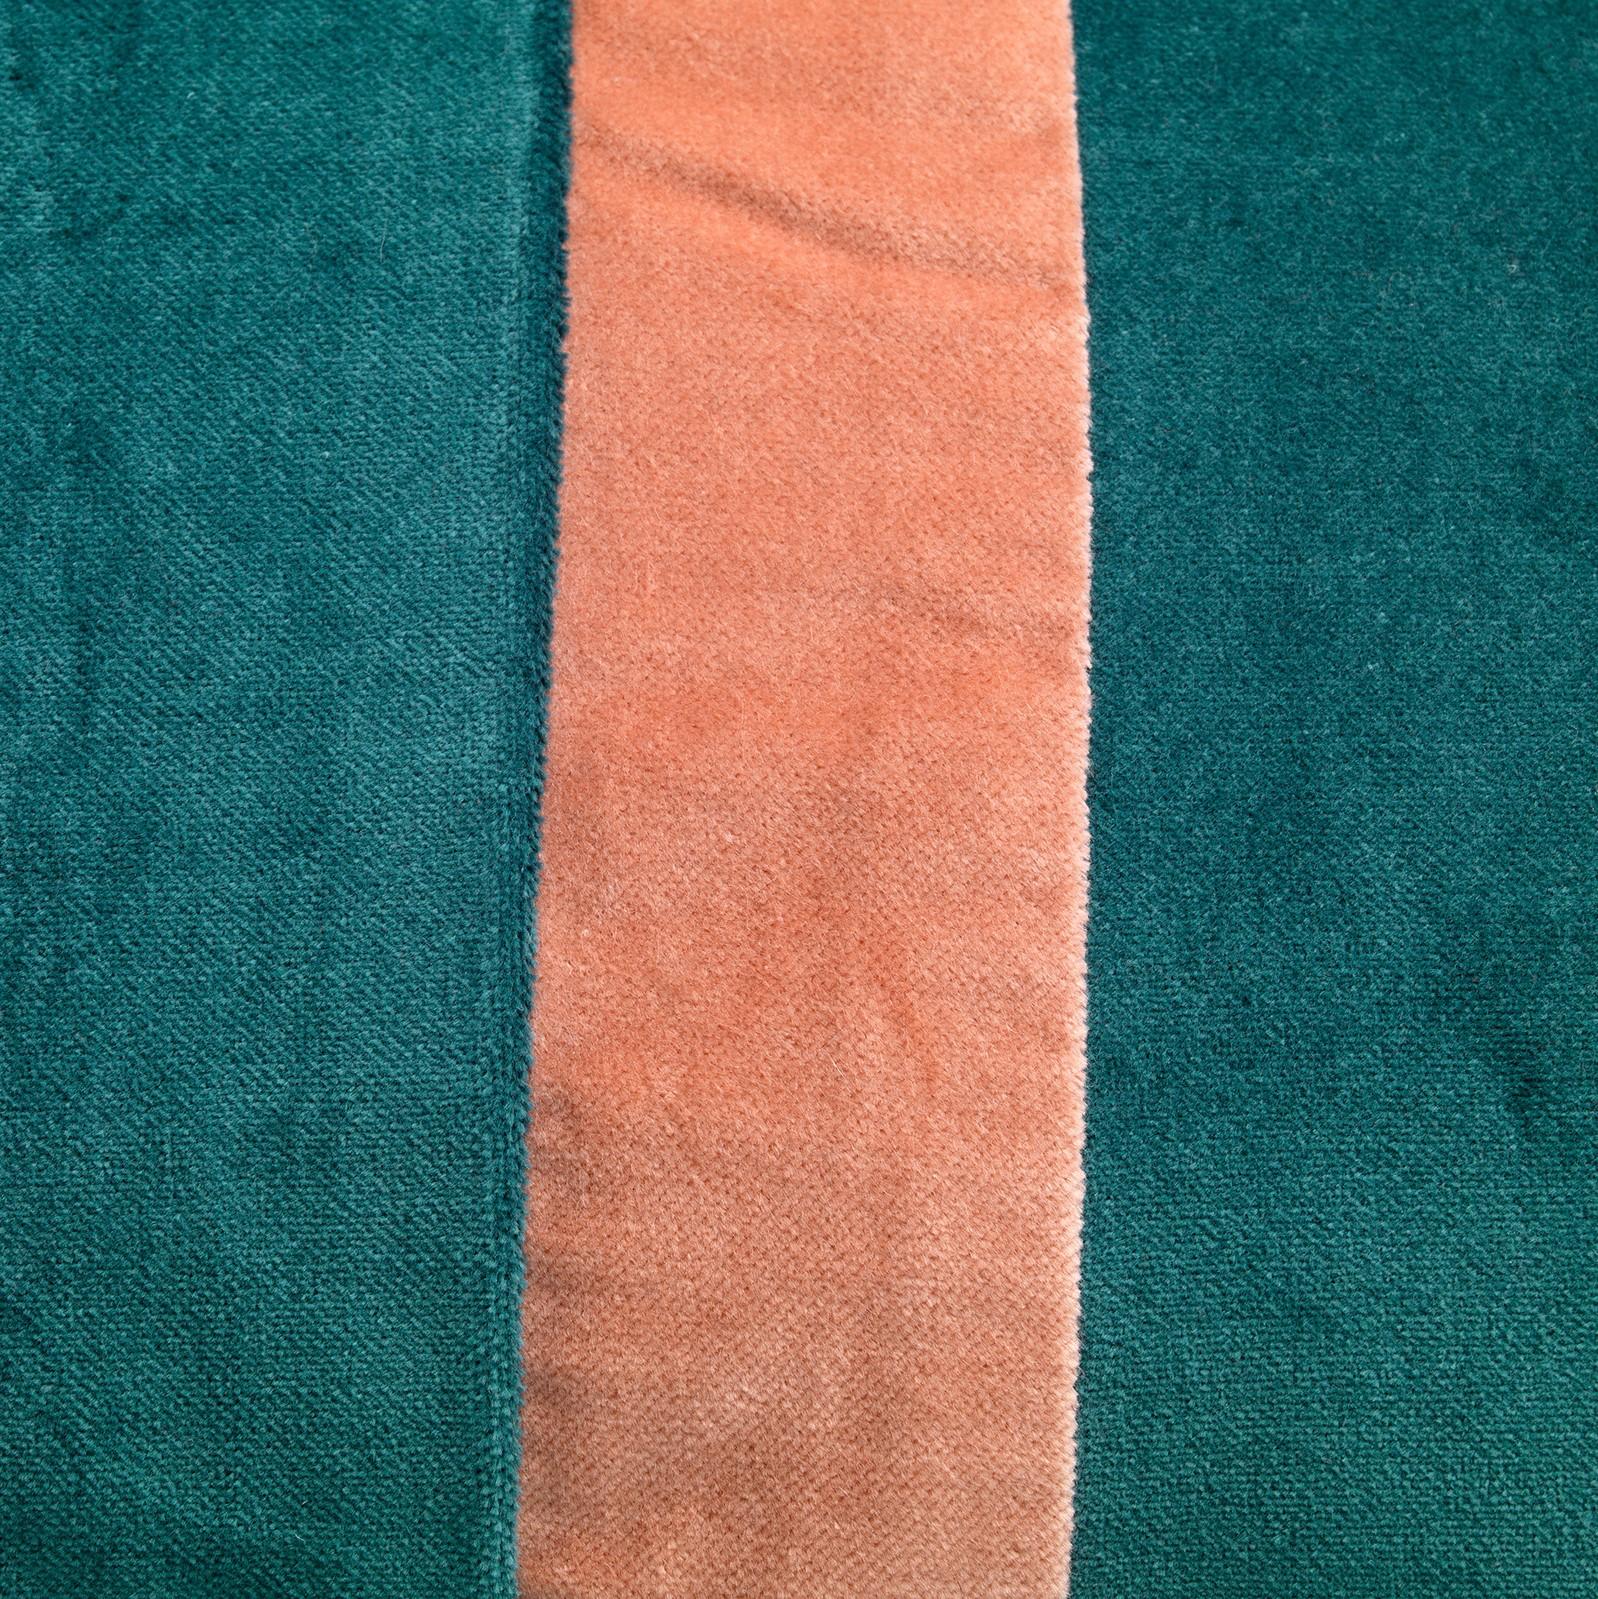 PIPPA - Sierkussen velvet Sagebrush Green 30x50 cm